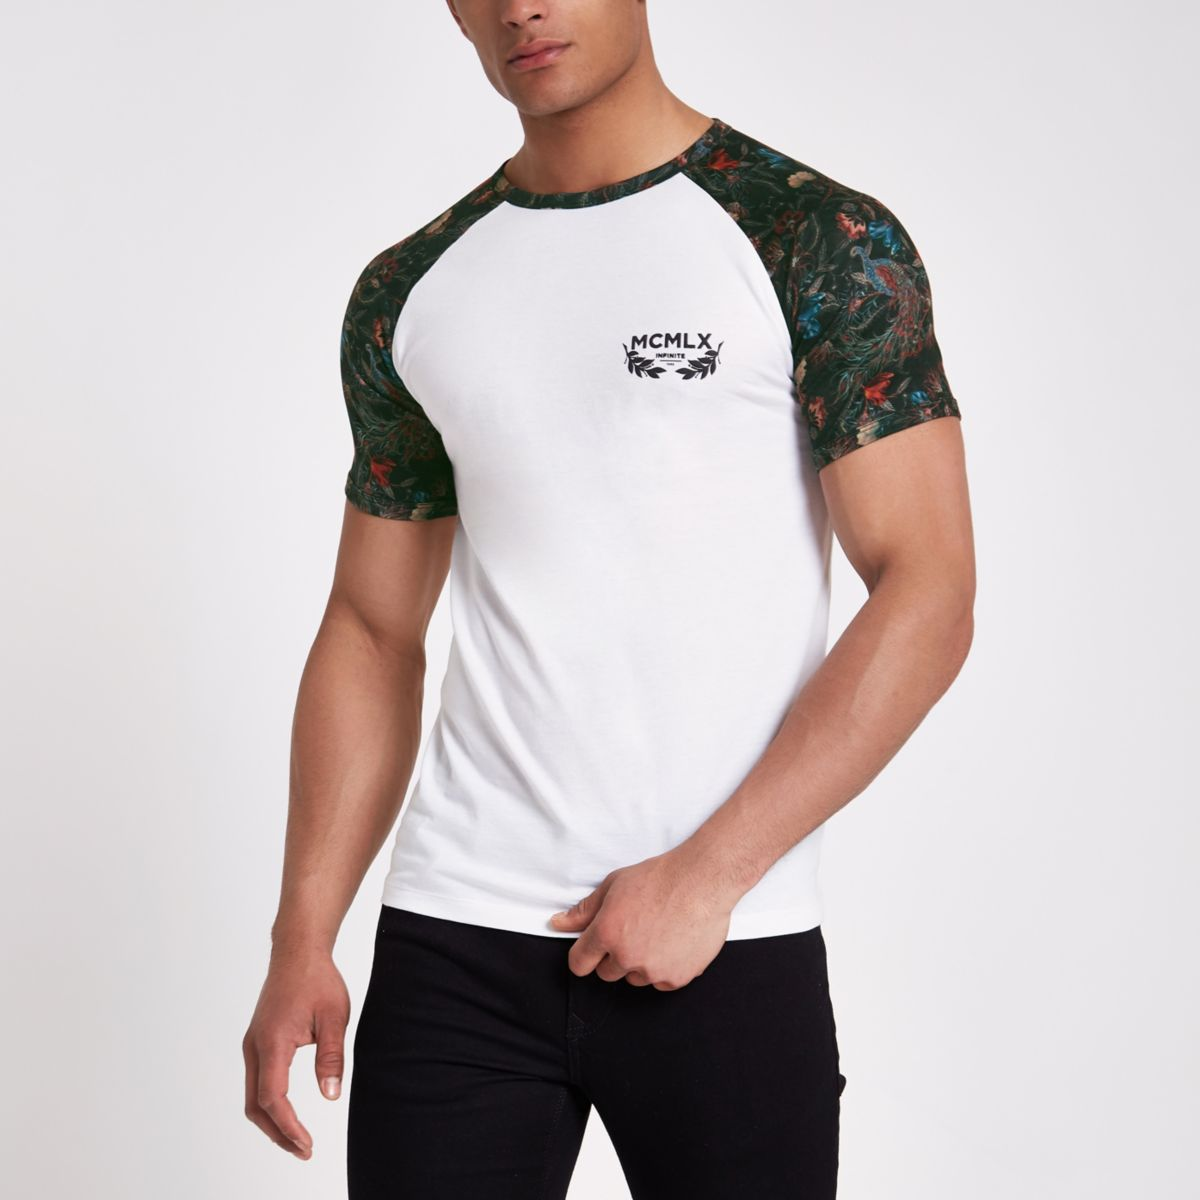 White 'MCMLX' muscle fit raglan T-shirt